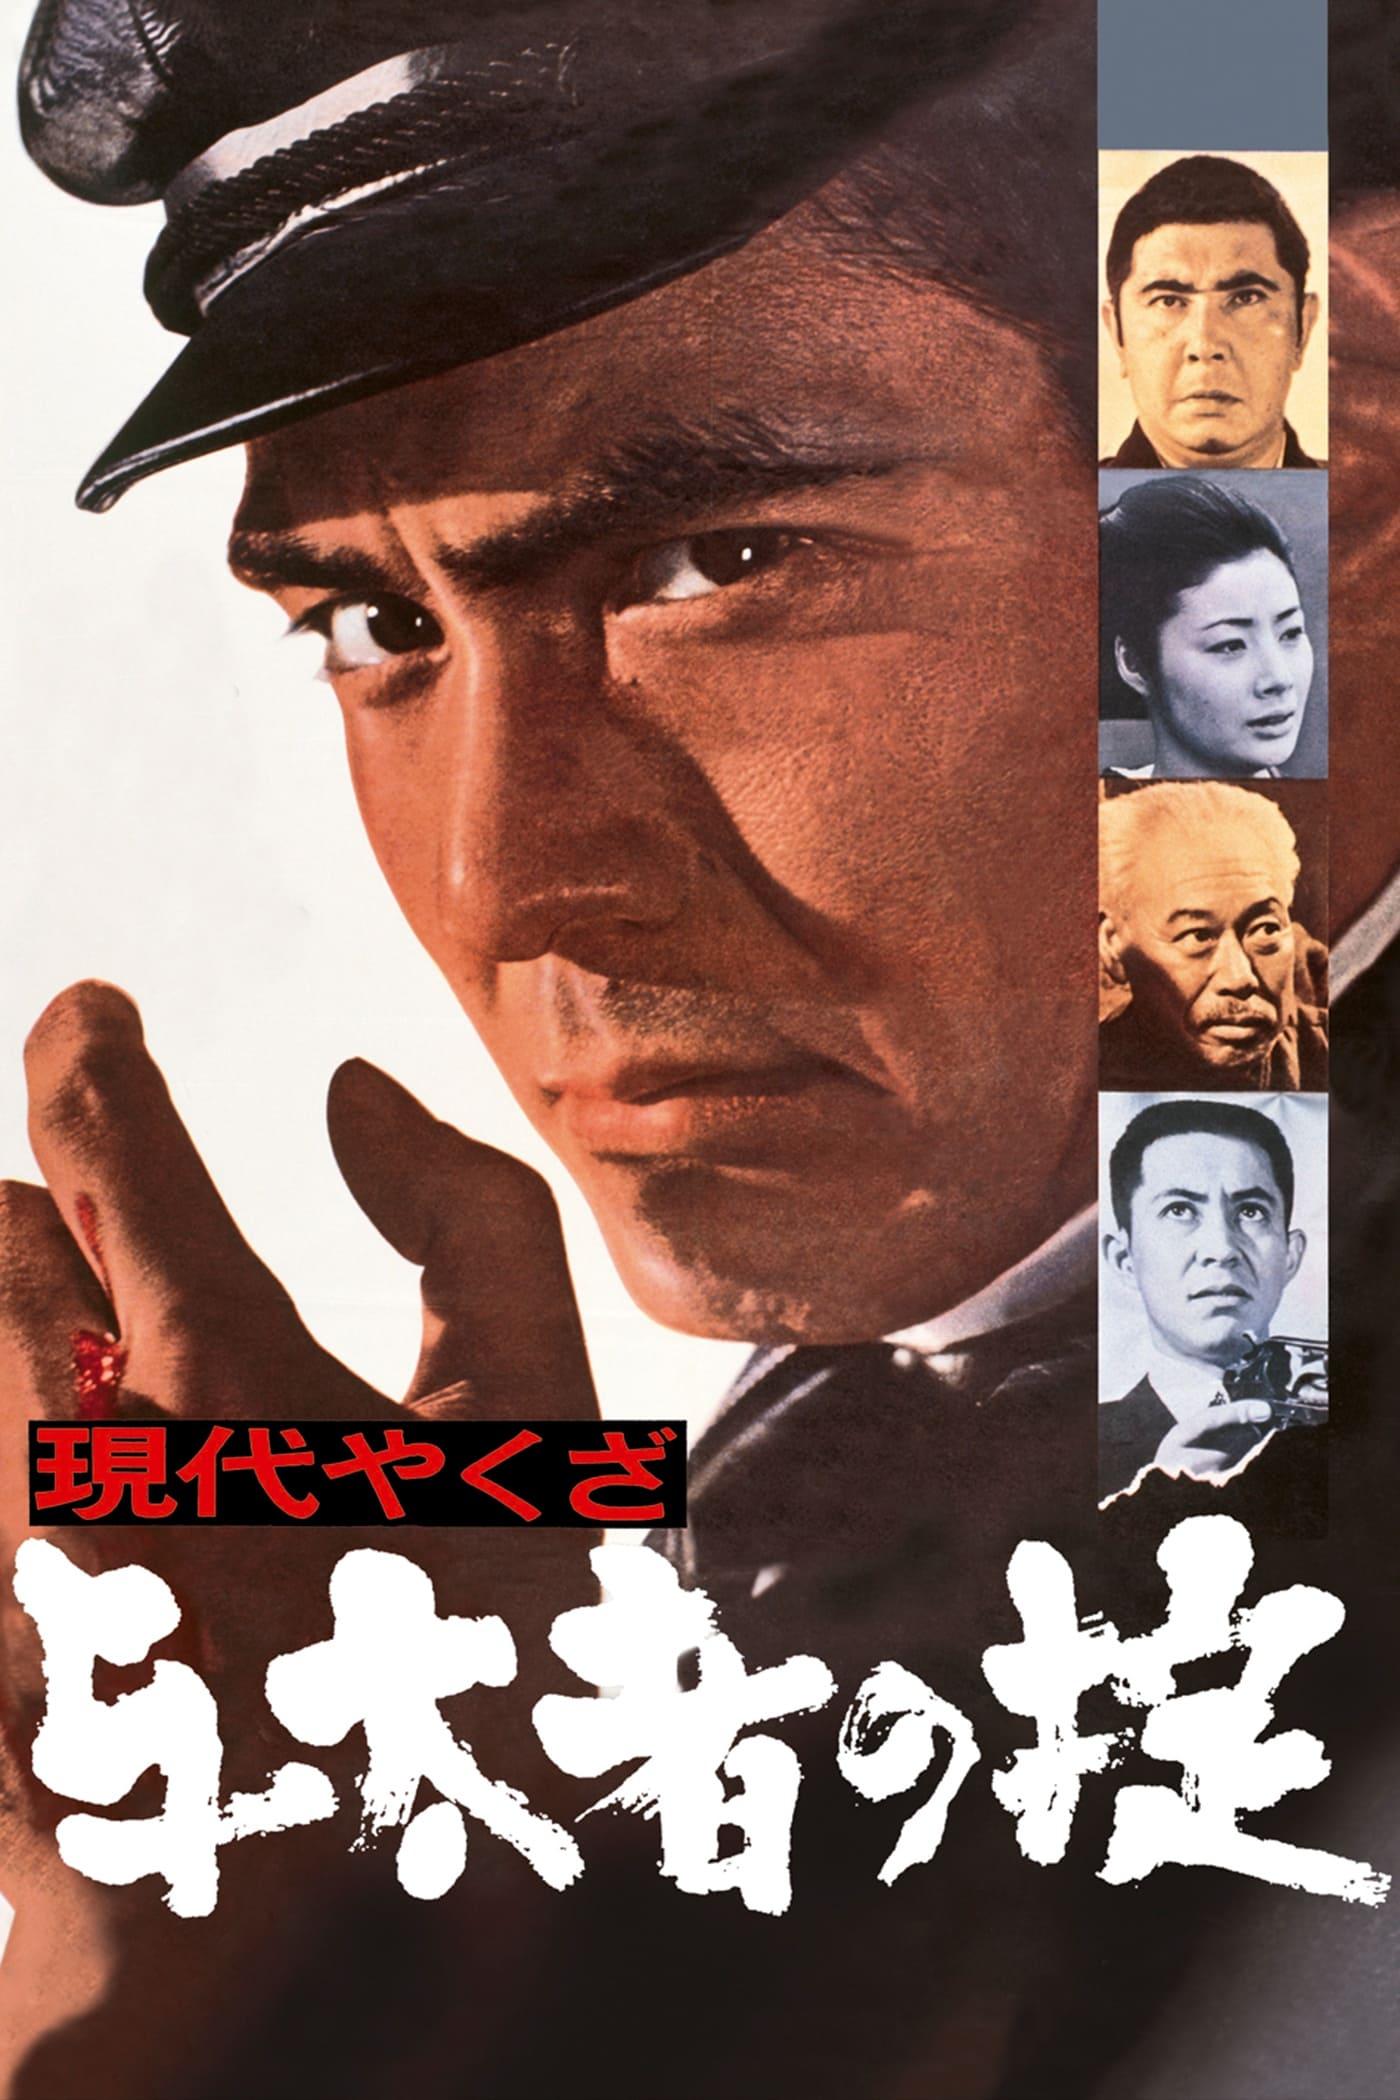 A Modern Yakuza: The Code of The Lawless